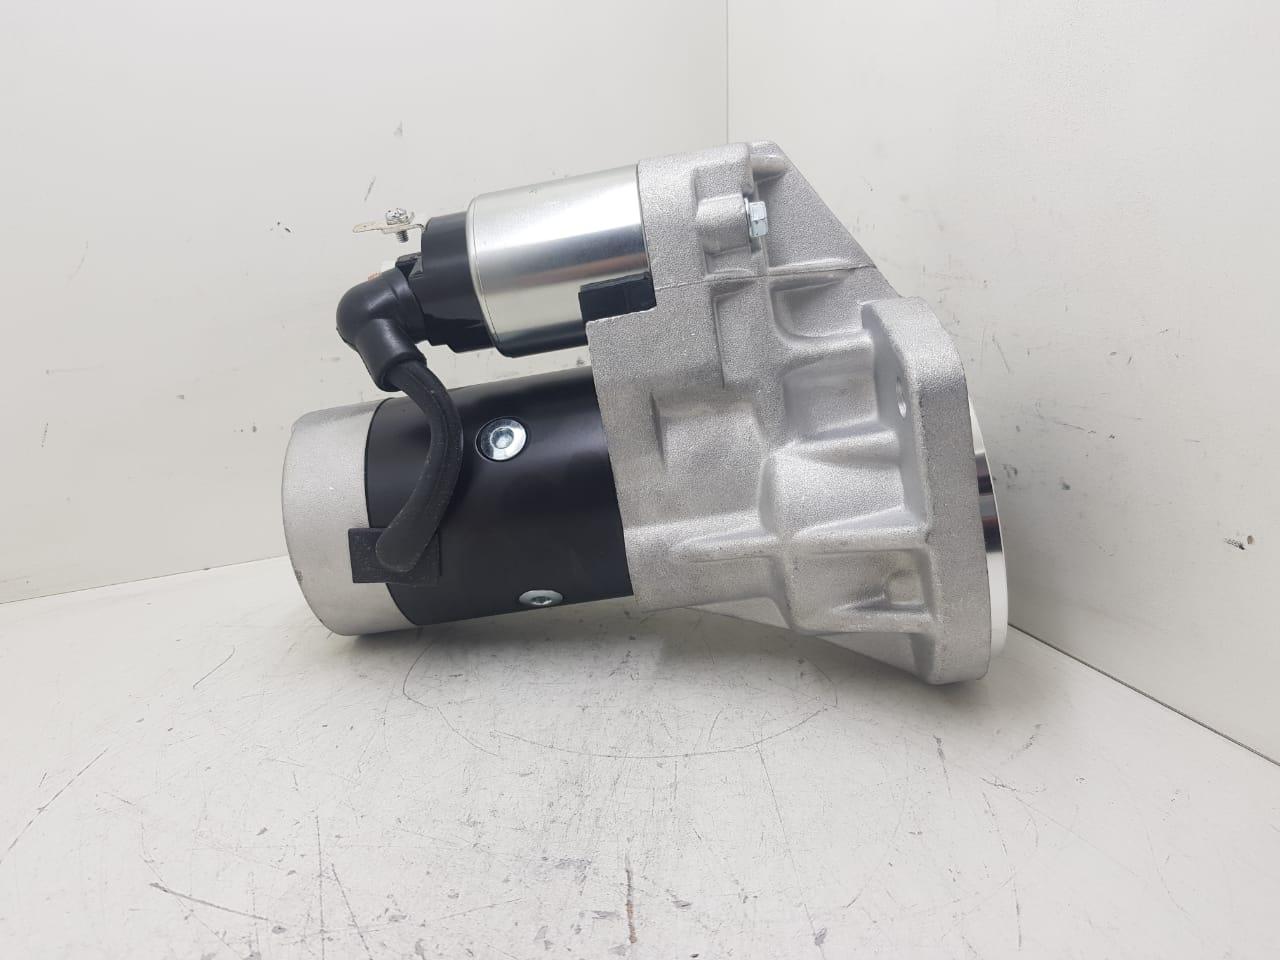 Motor de arranque Thermoking Nissan Motor FRONTIER NAVARA 2.7 D21 D22 TD27 HITACHI 12V 9 DENTES LE13050111  S13106 S13106 98601031 2130726 0113106 HXS020 0986016031 110574 S30726 11903 AEC17015